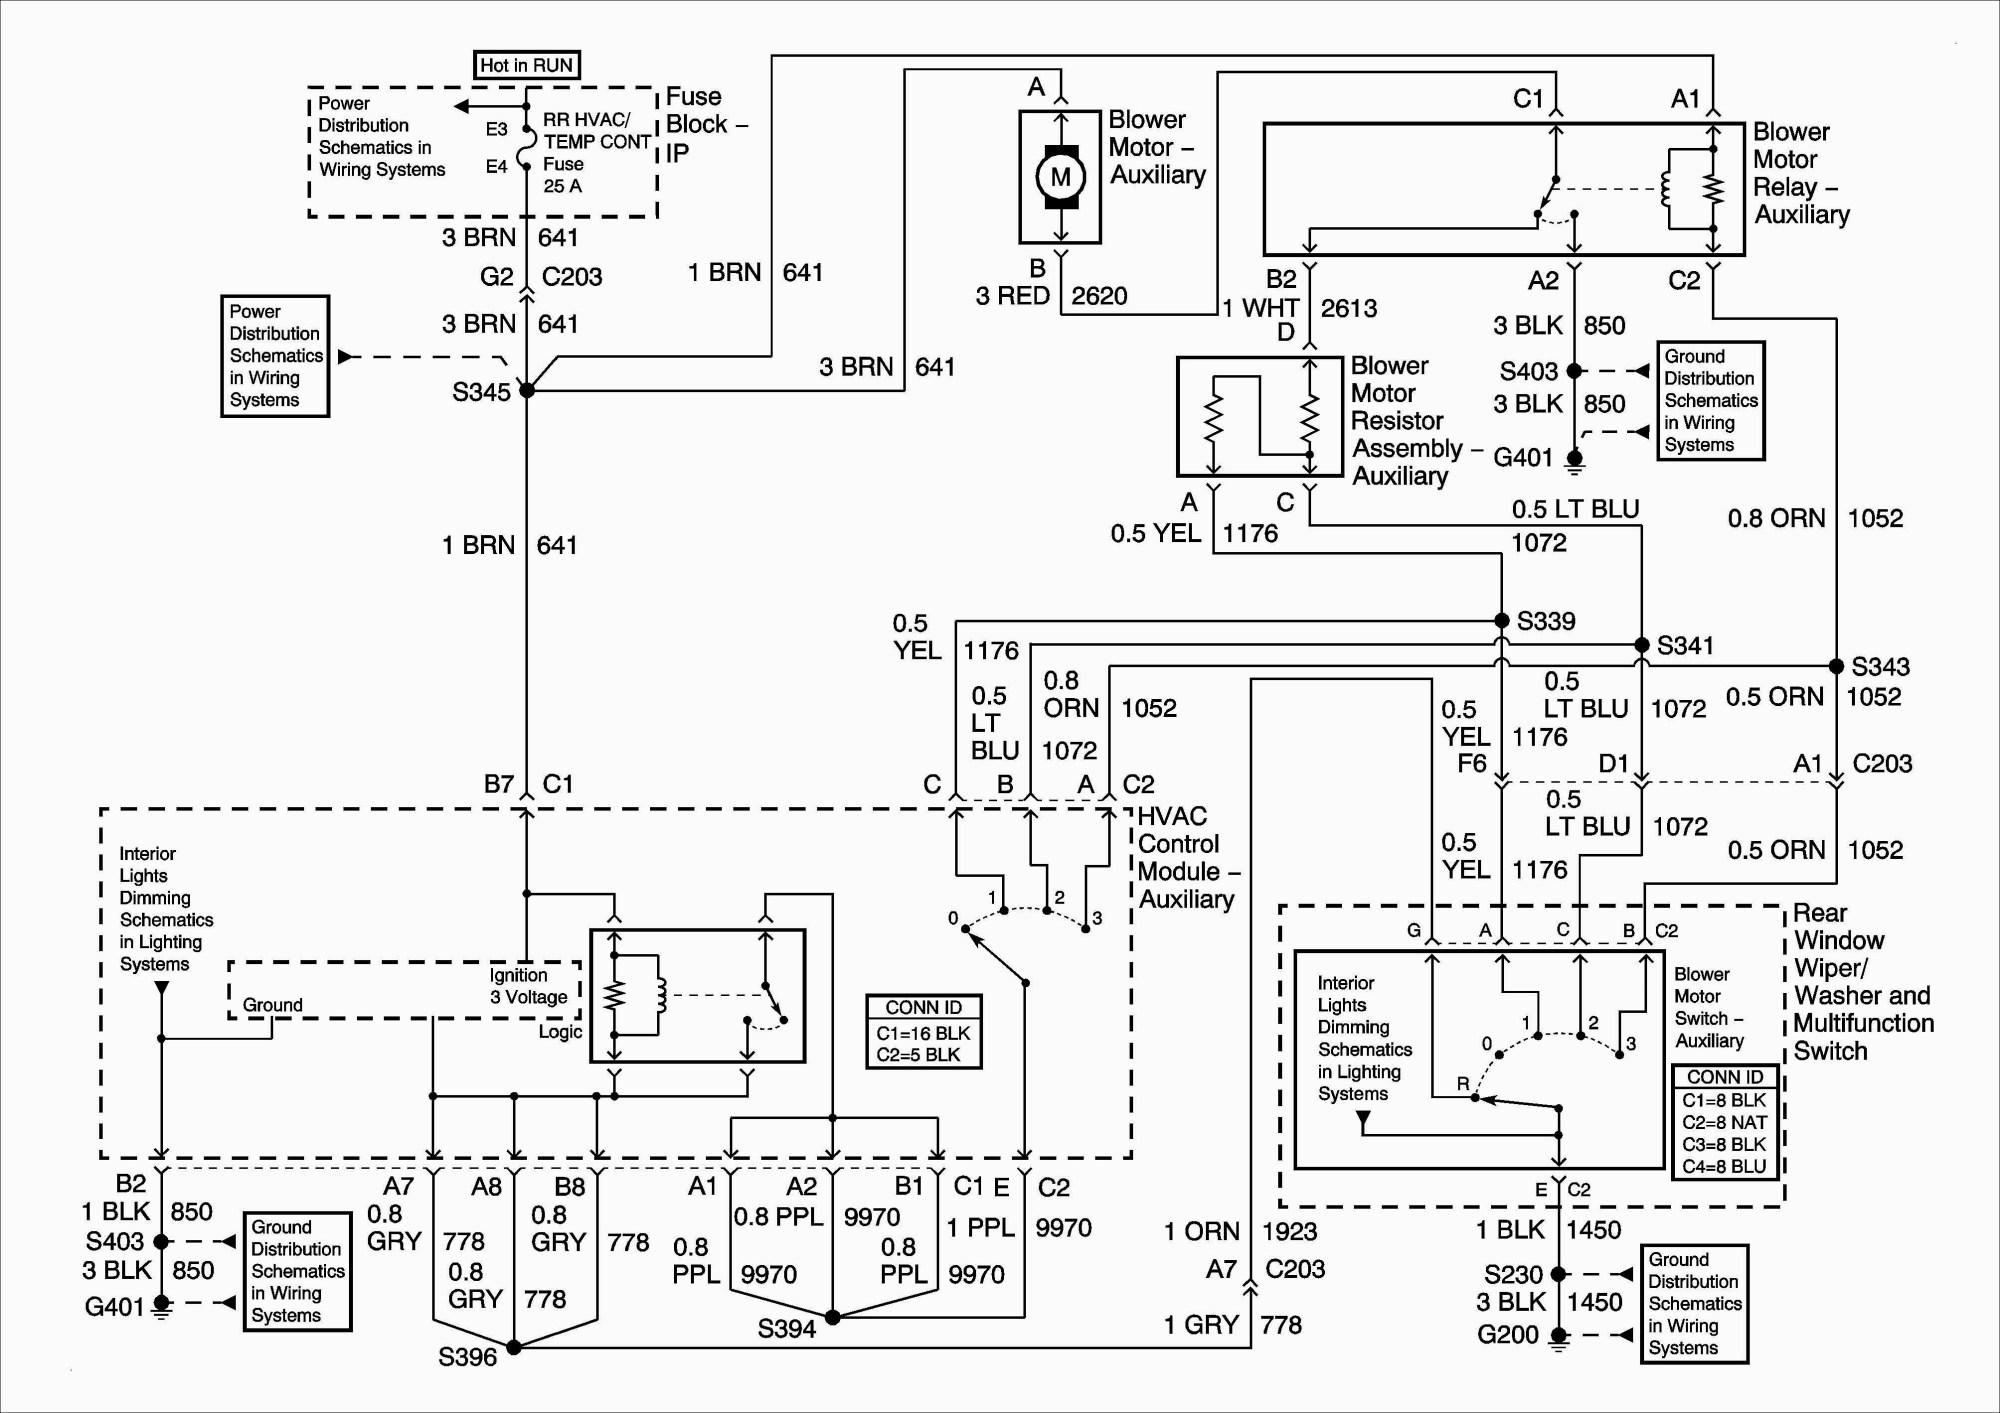 hight resolution of freightliner air system diagram freightliner m2 blower motor wiring diagram zookastar of freightliner air system diagram